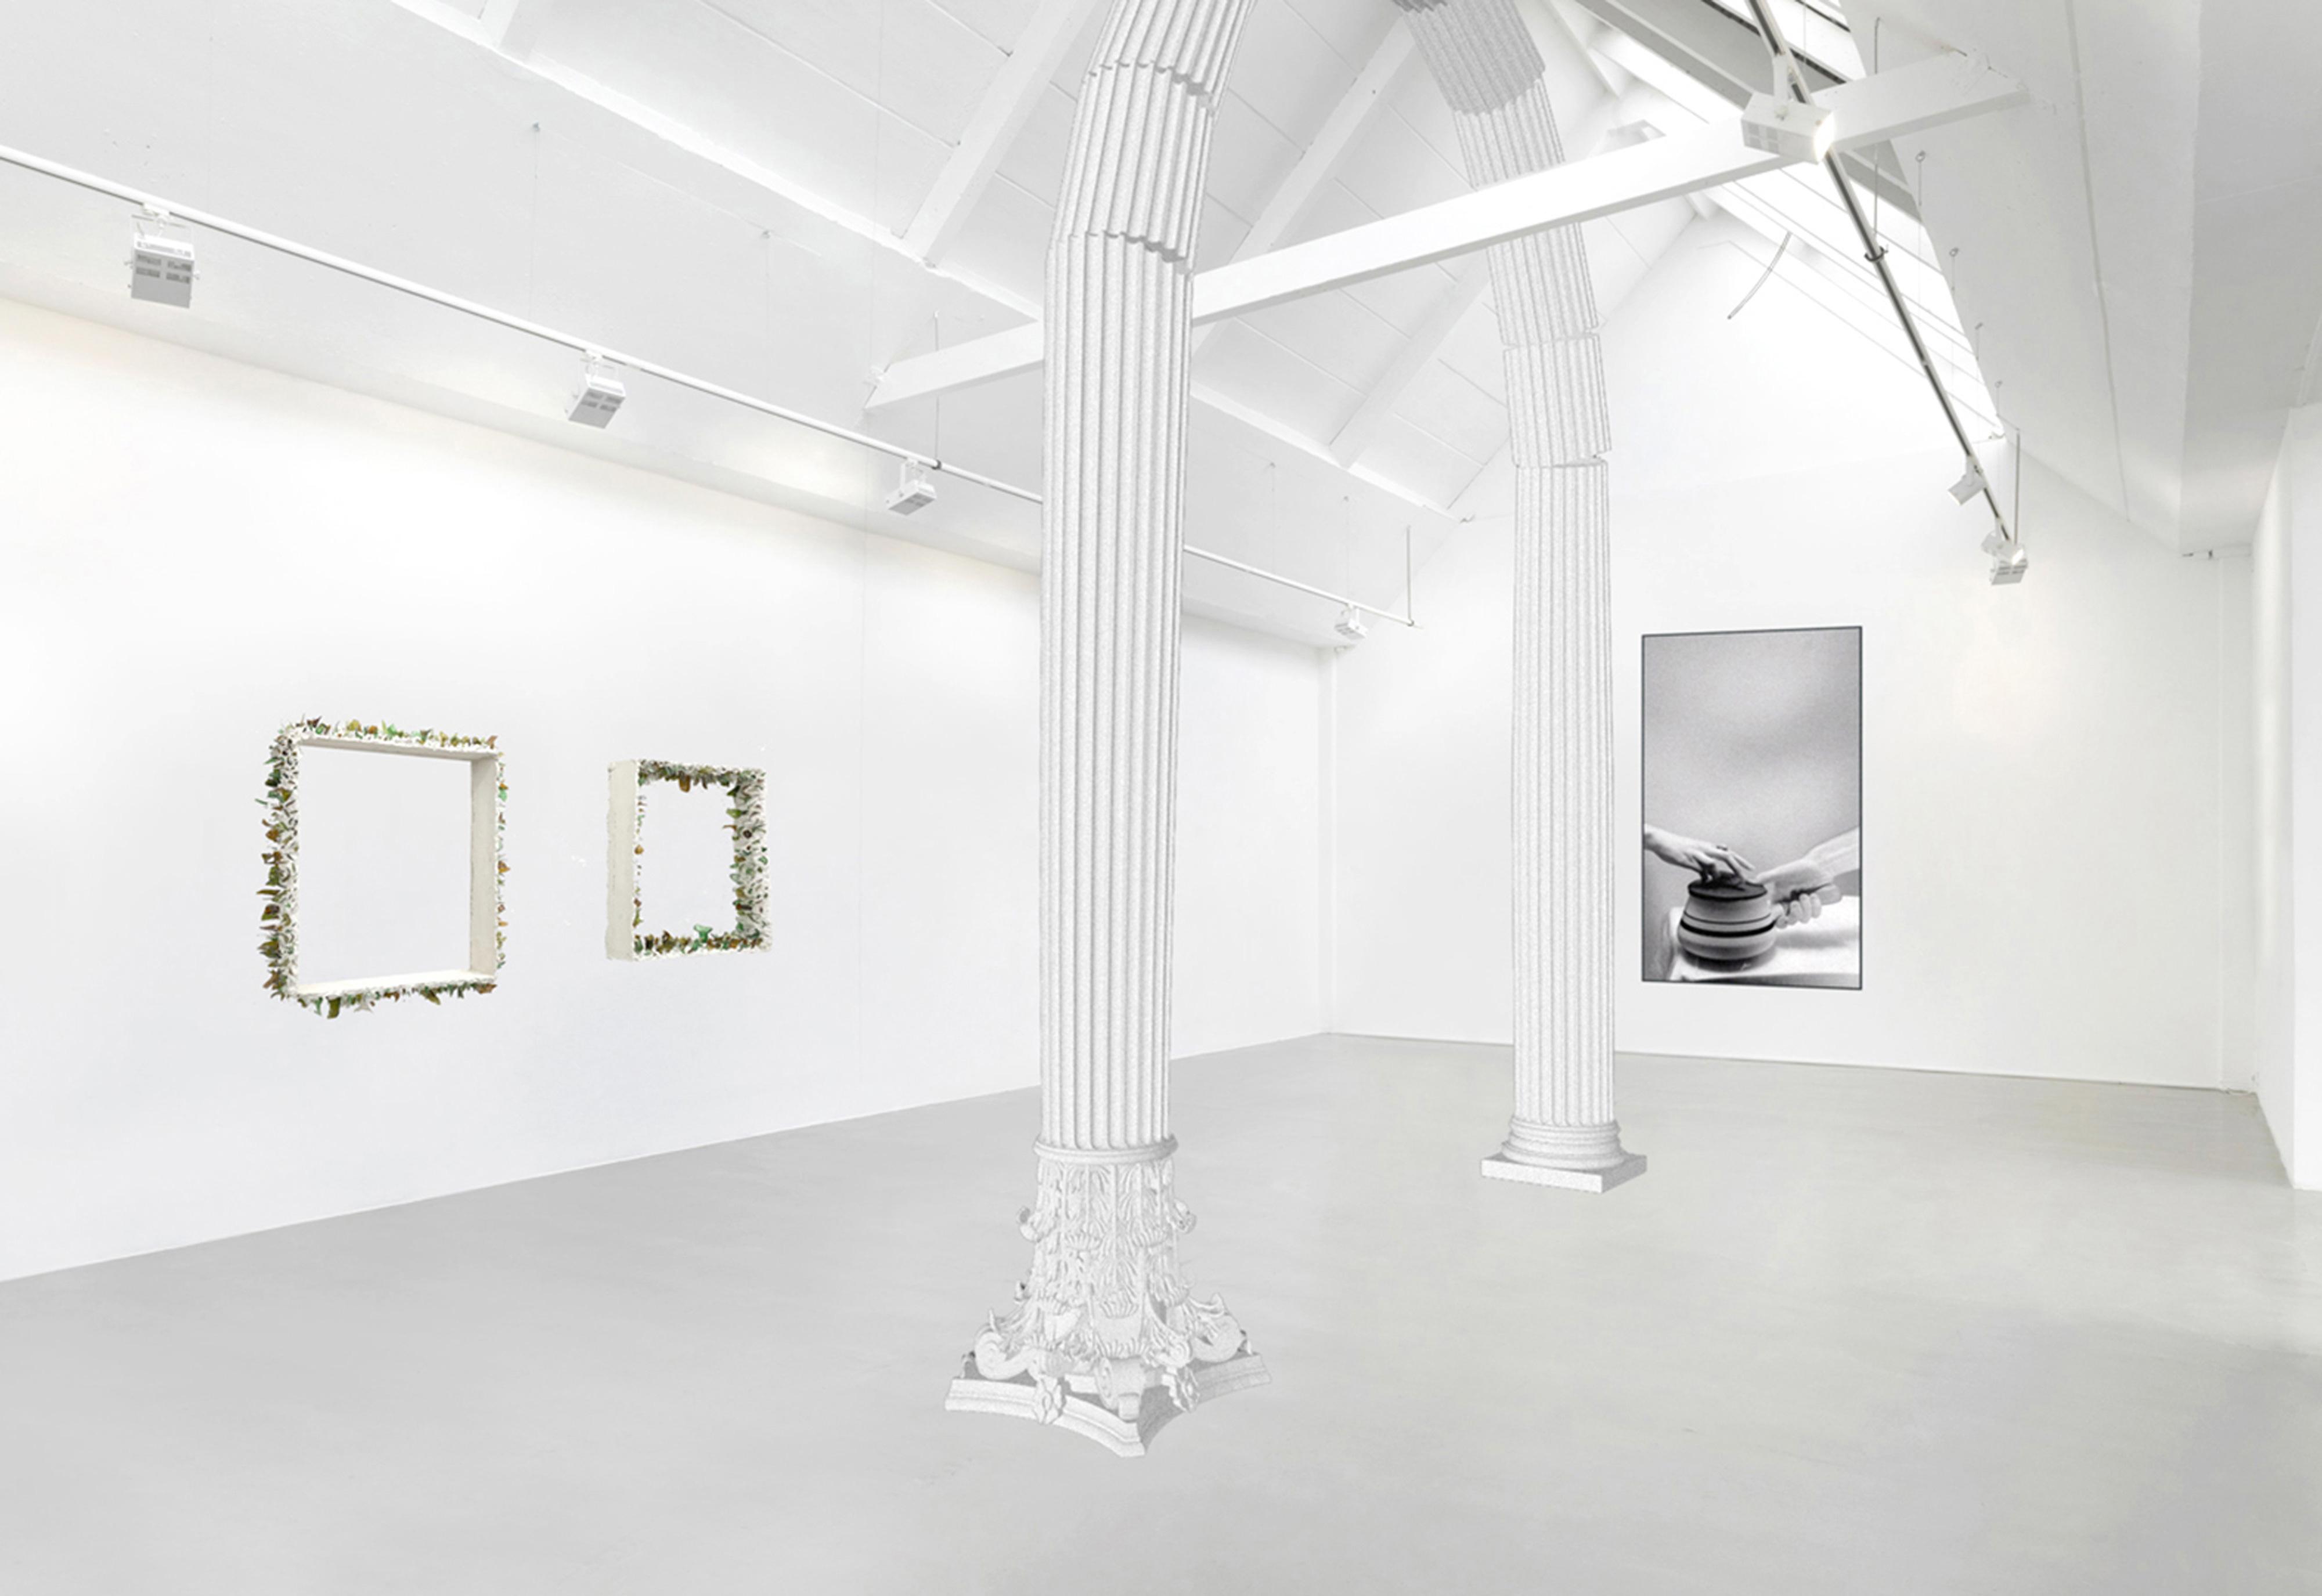 Galerie Barbara Thumm \ New Viewings #19 \ Alejandro Almanza